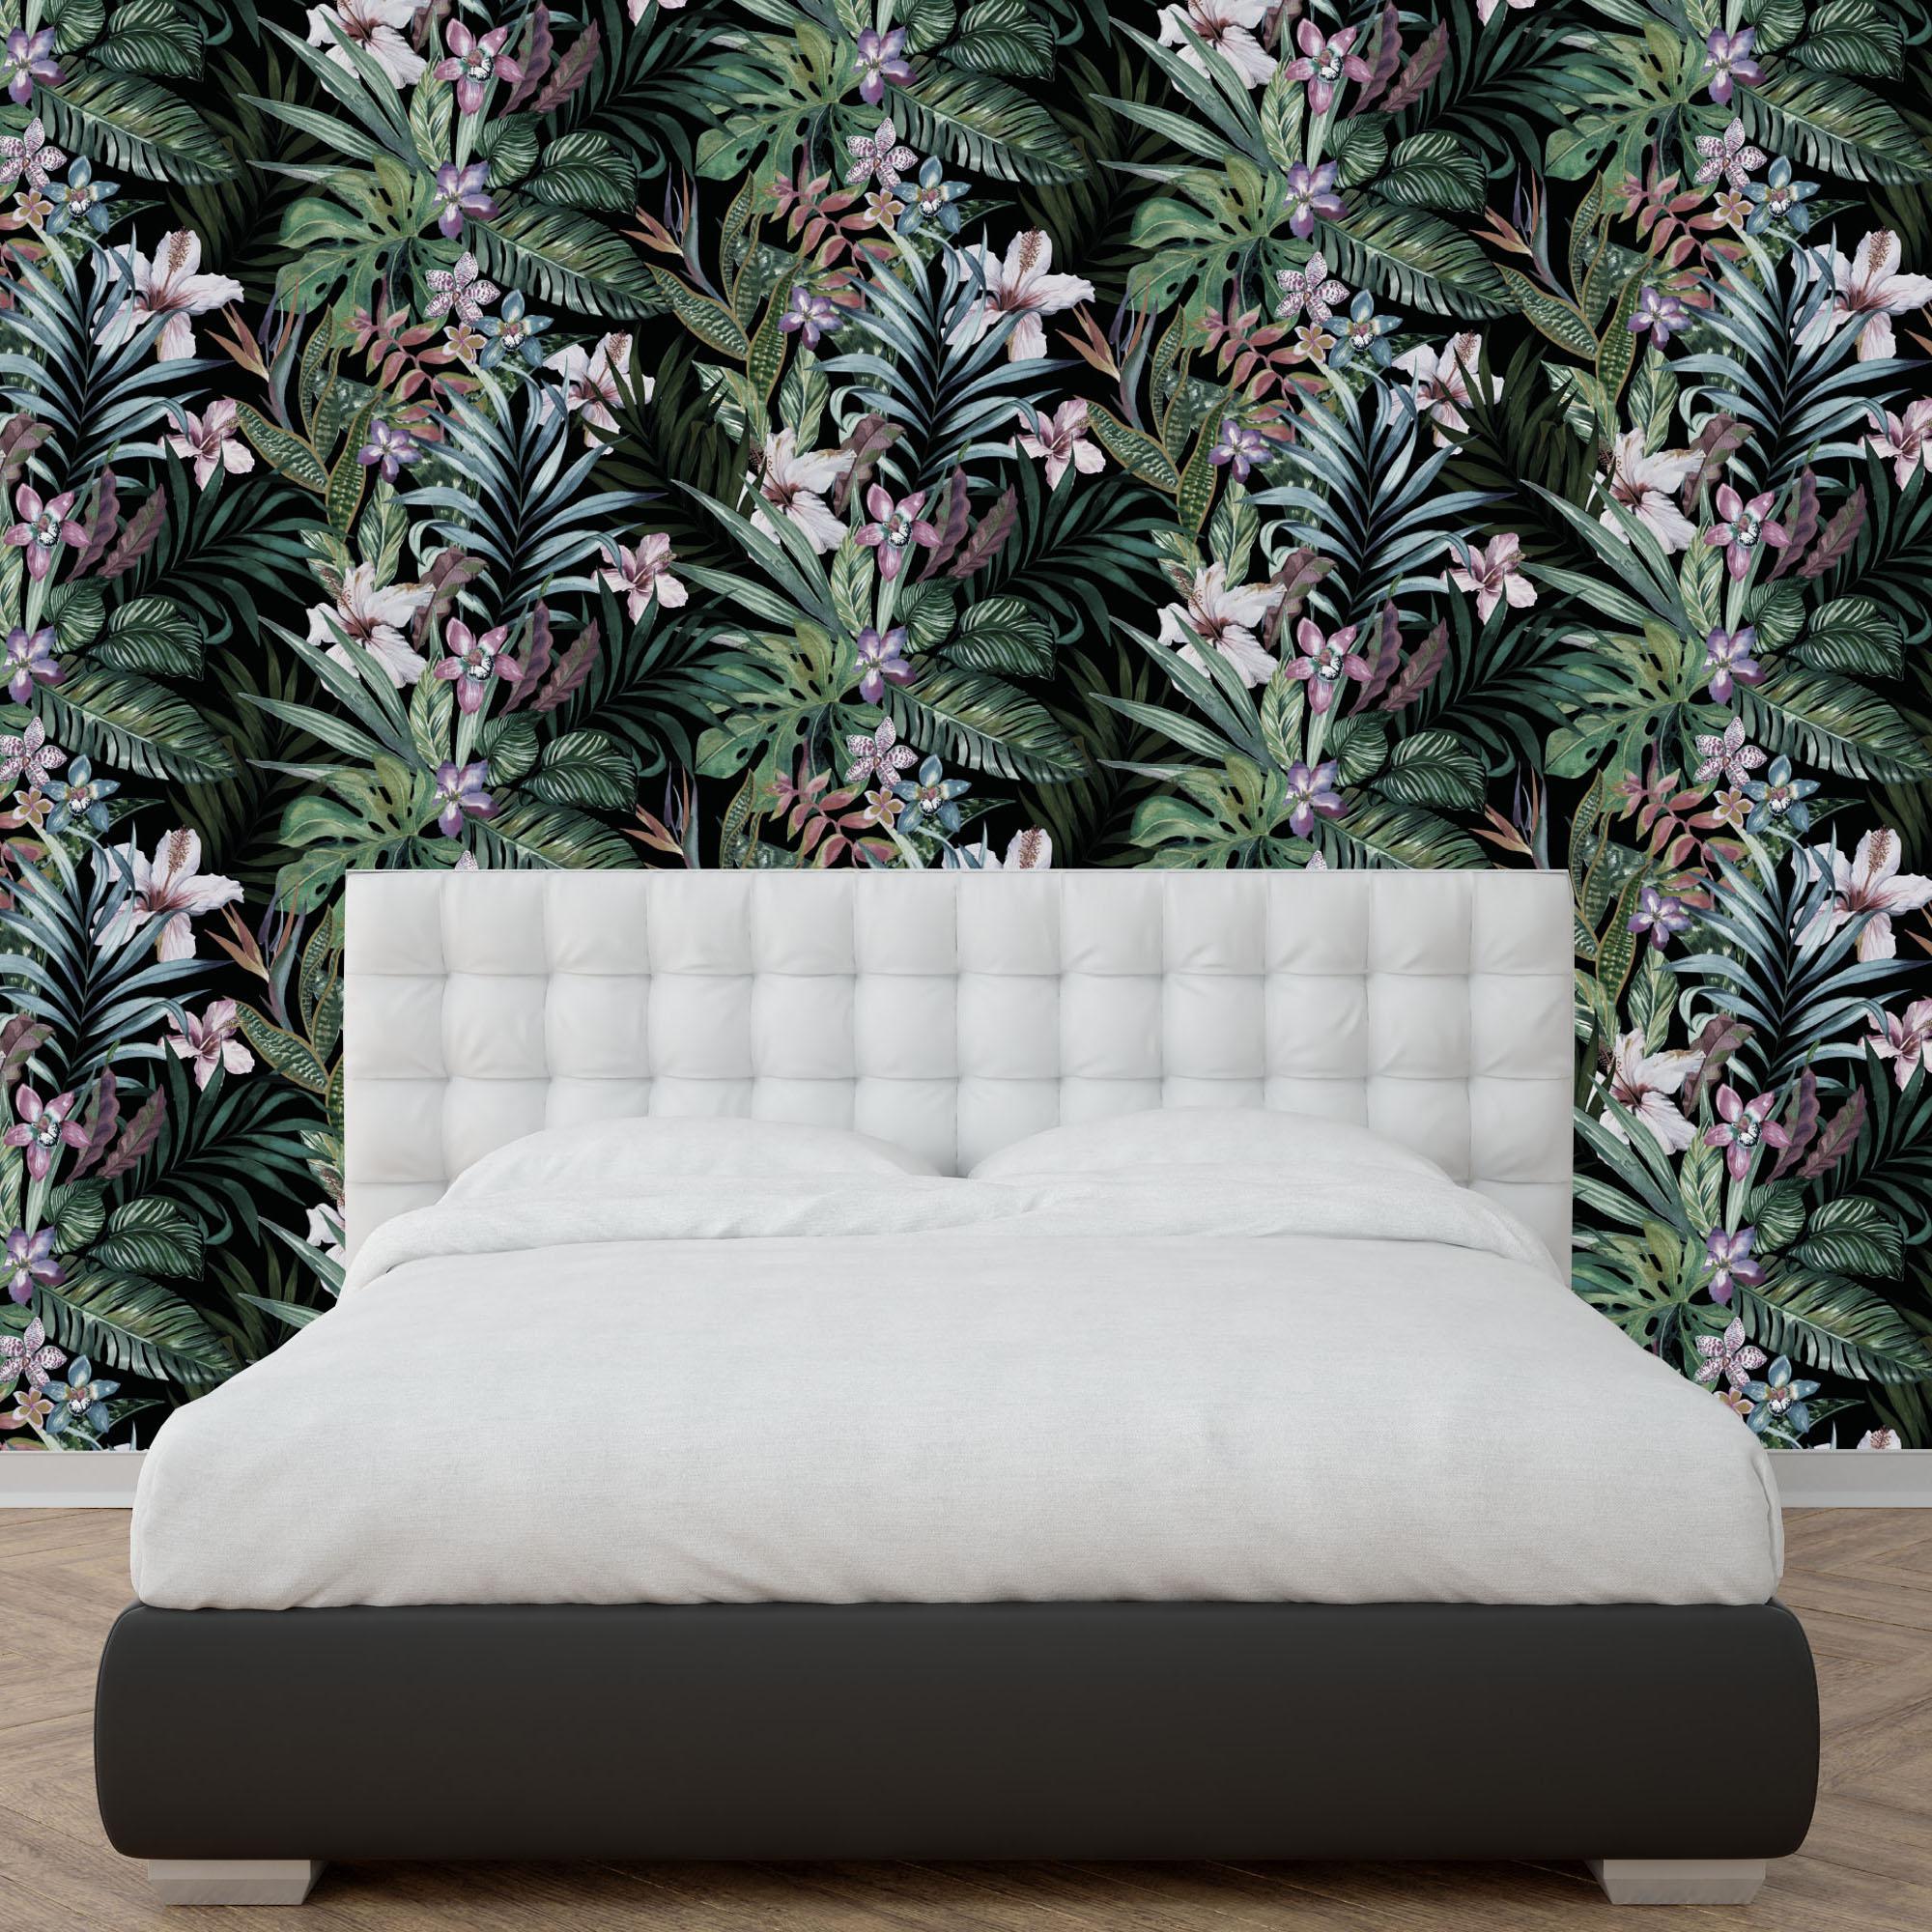 Botanical Peel and Stick Wallpaper - Moonwallstickers.com